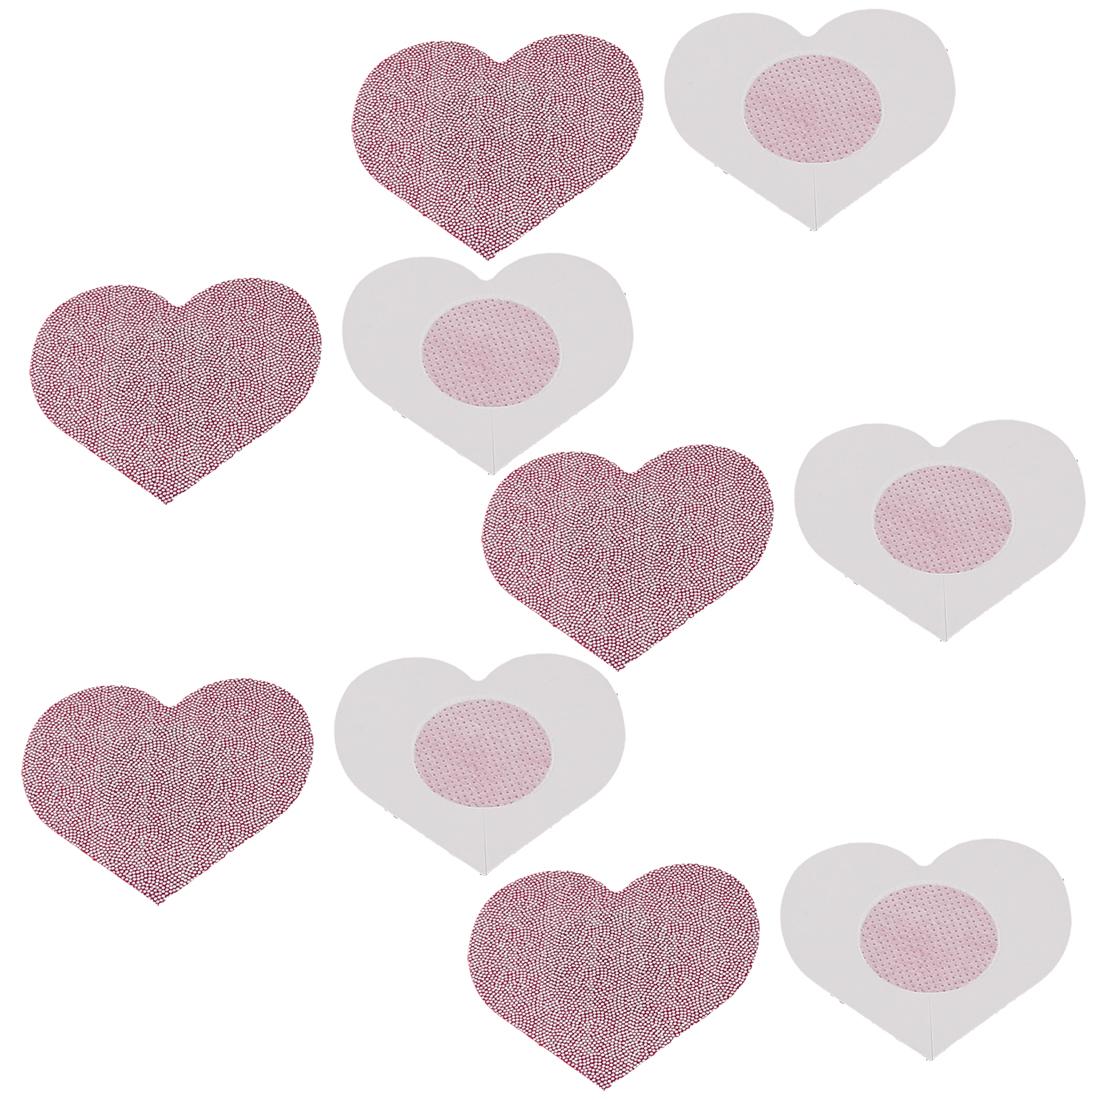 Lady Woman Heart Shape Nipple Breast Sticker Cover Bra Pad Pink 5 Pairs